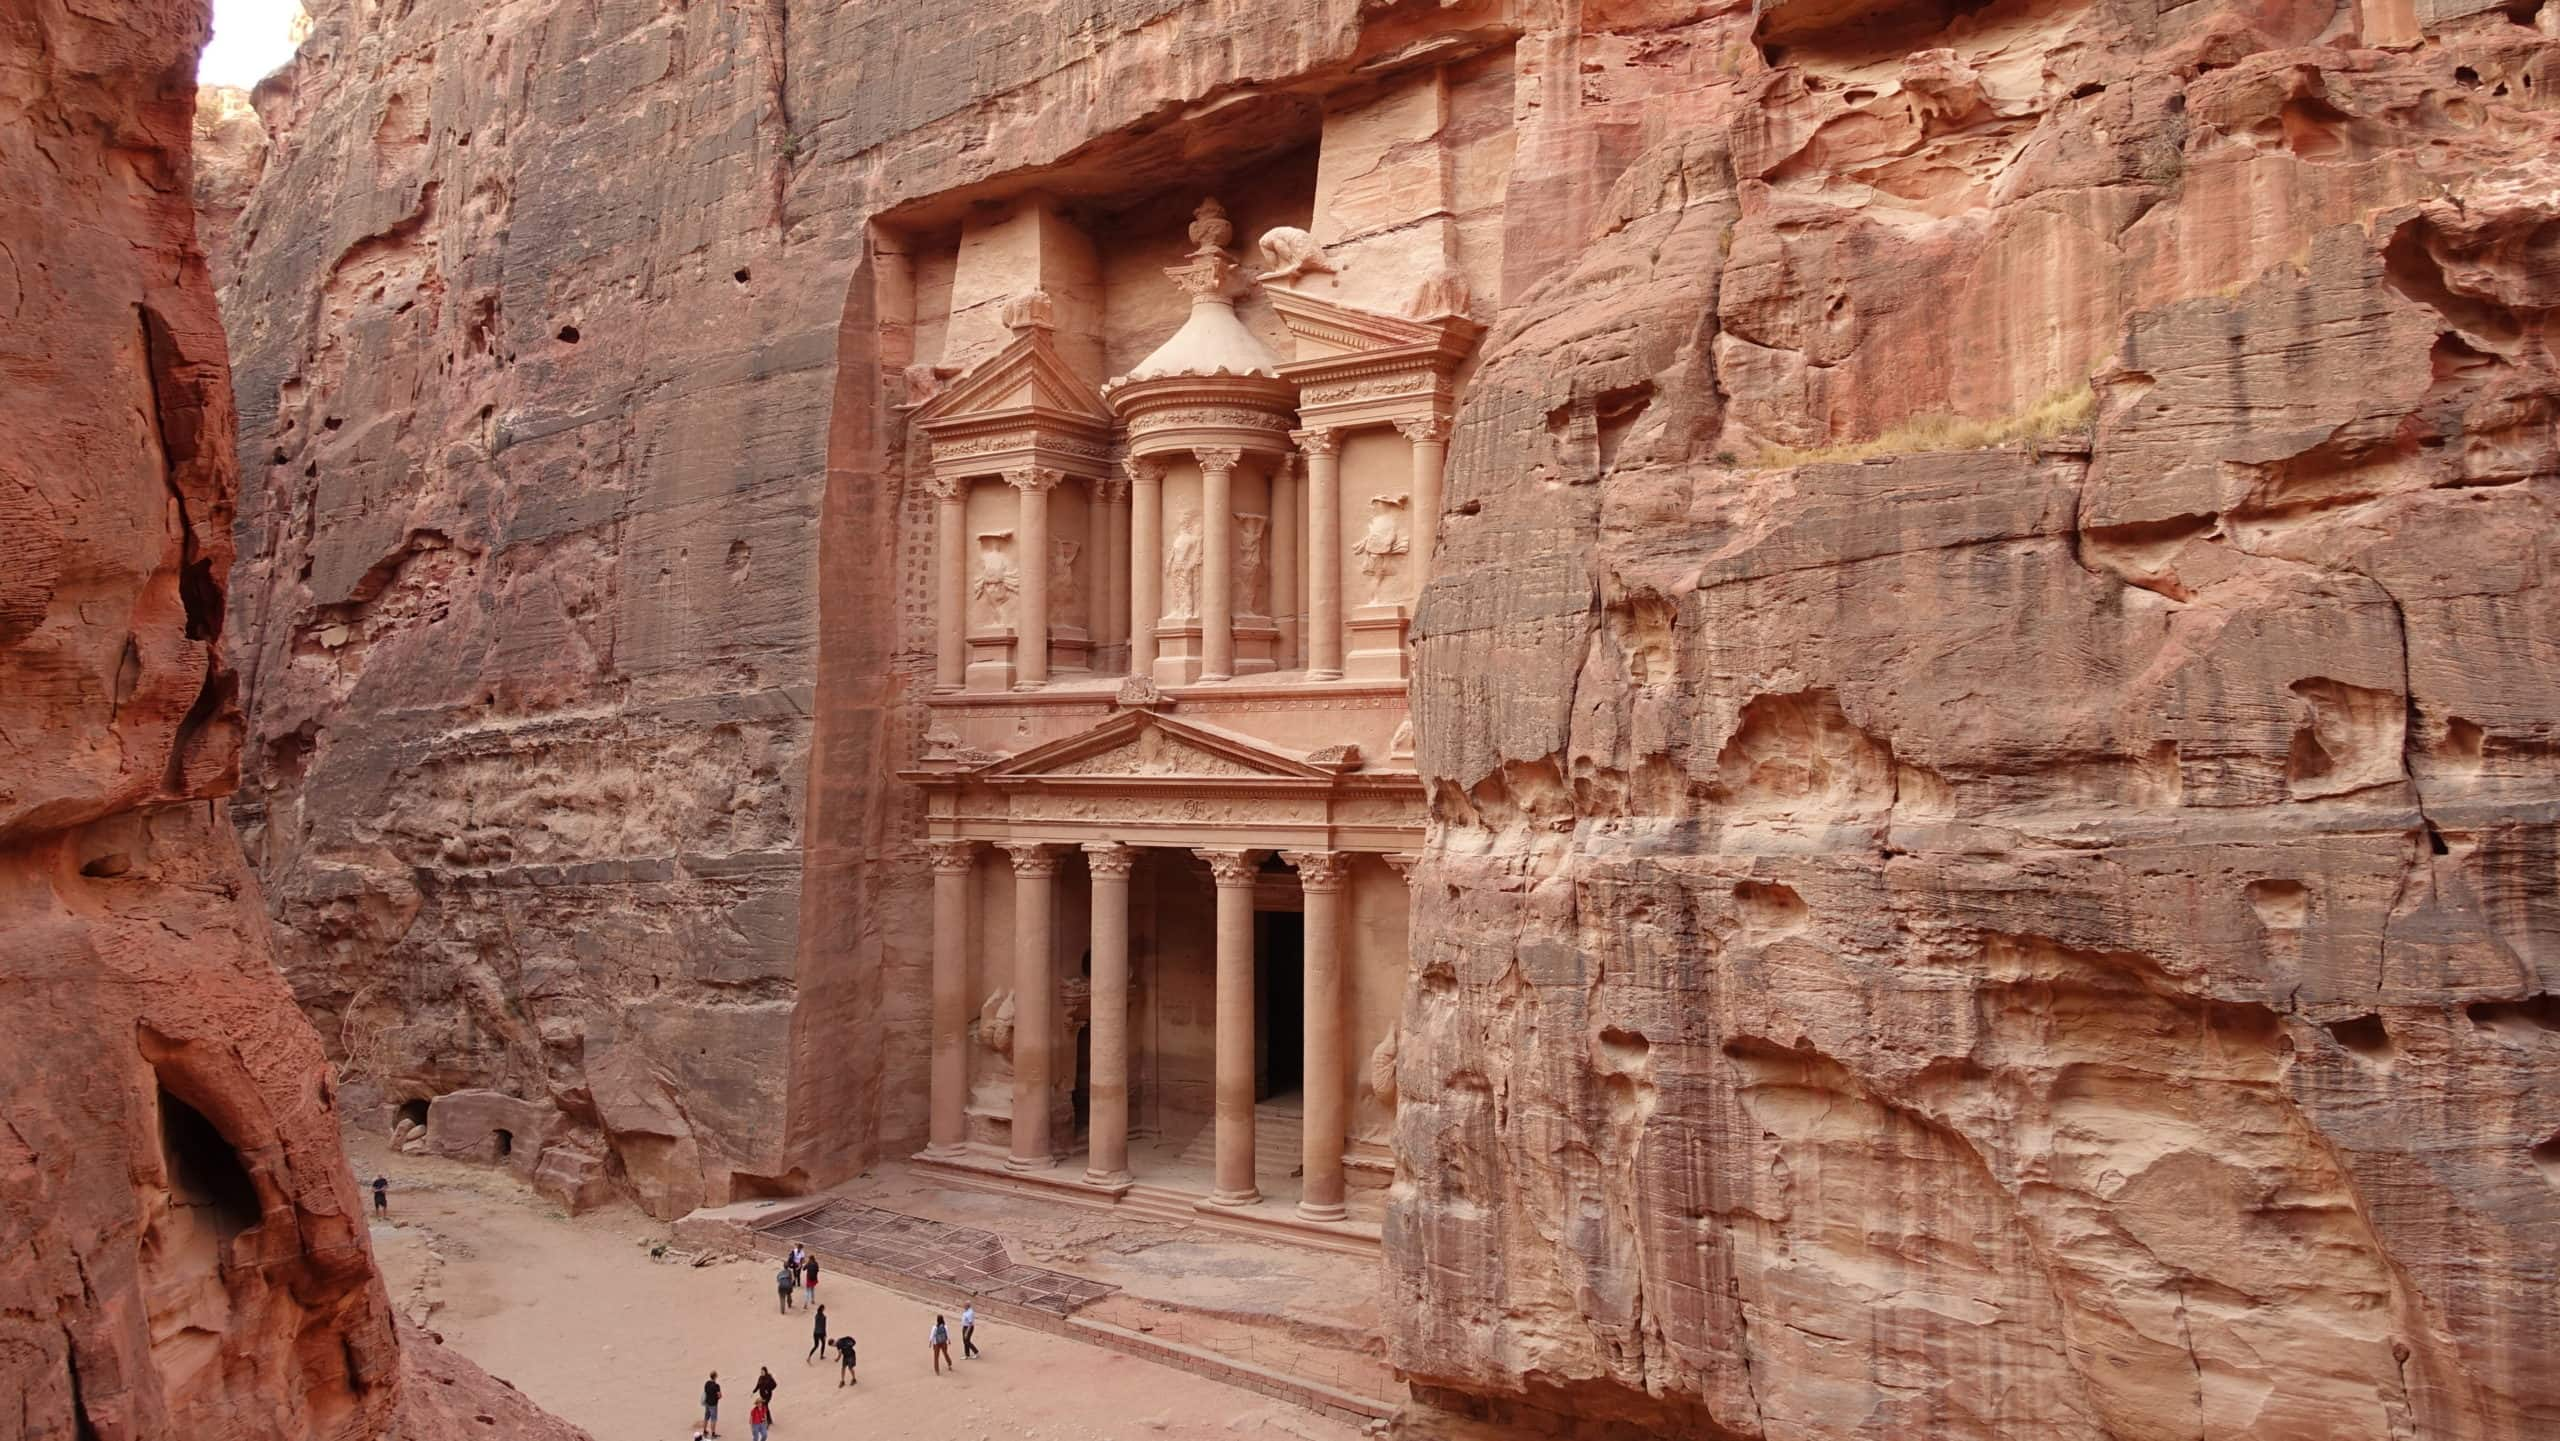 Das Schatzhaus in Petra in Jordanien